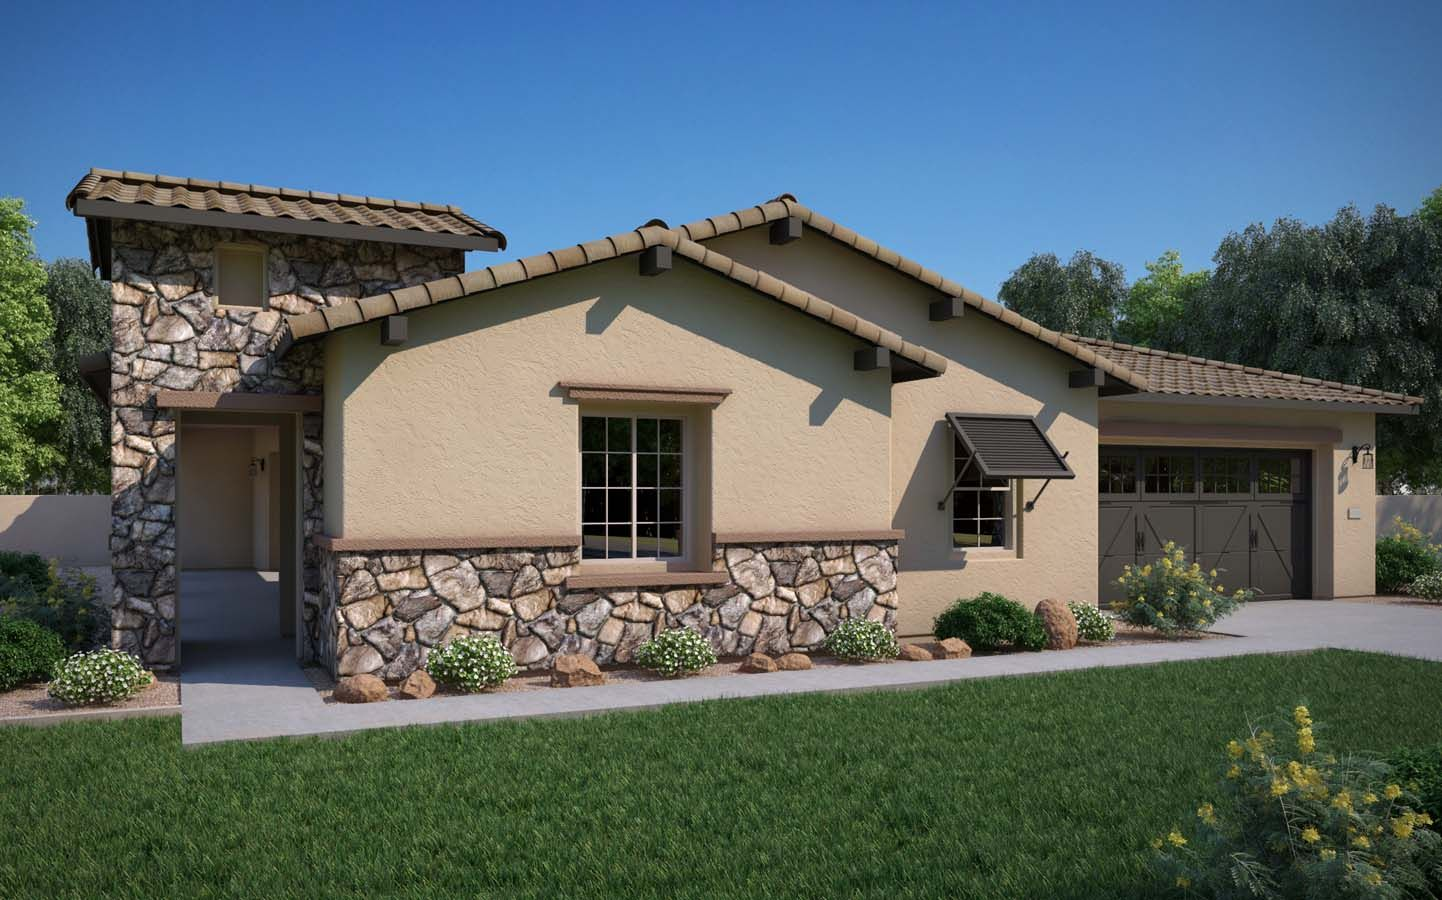 单亲家庭 为 销售 在 Residence 3 23144 N. 76th Ln. Peoria, Arizona 85383 United States